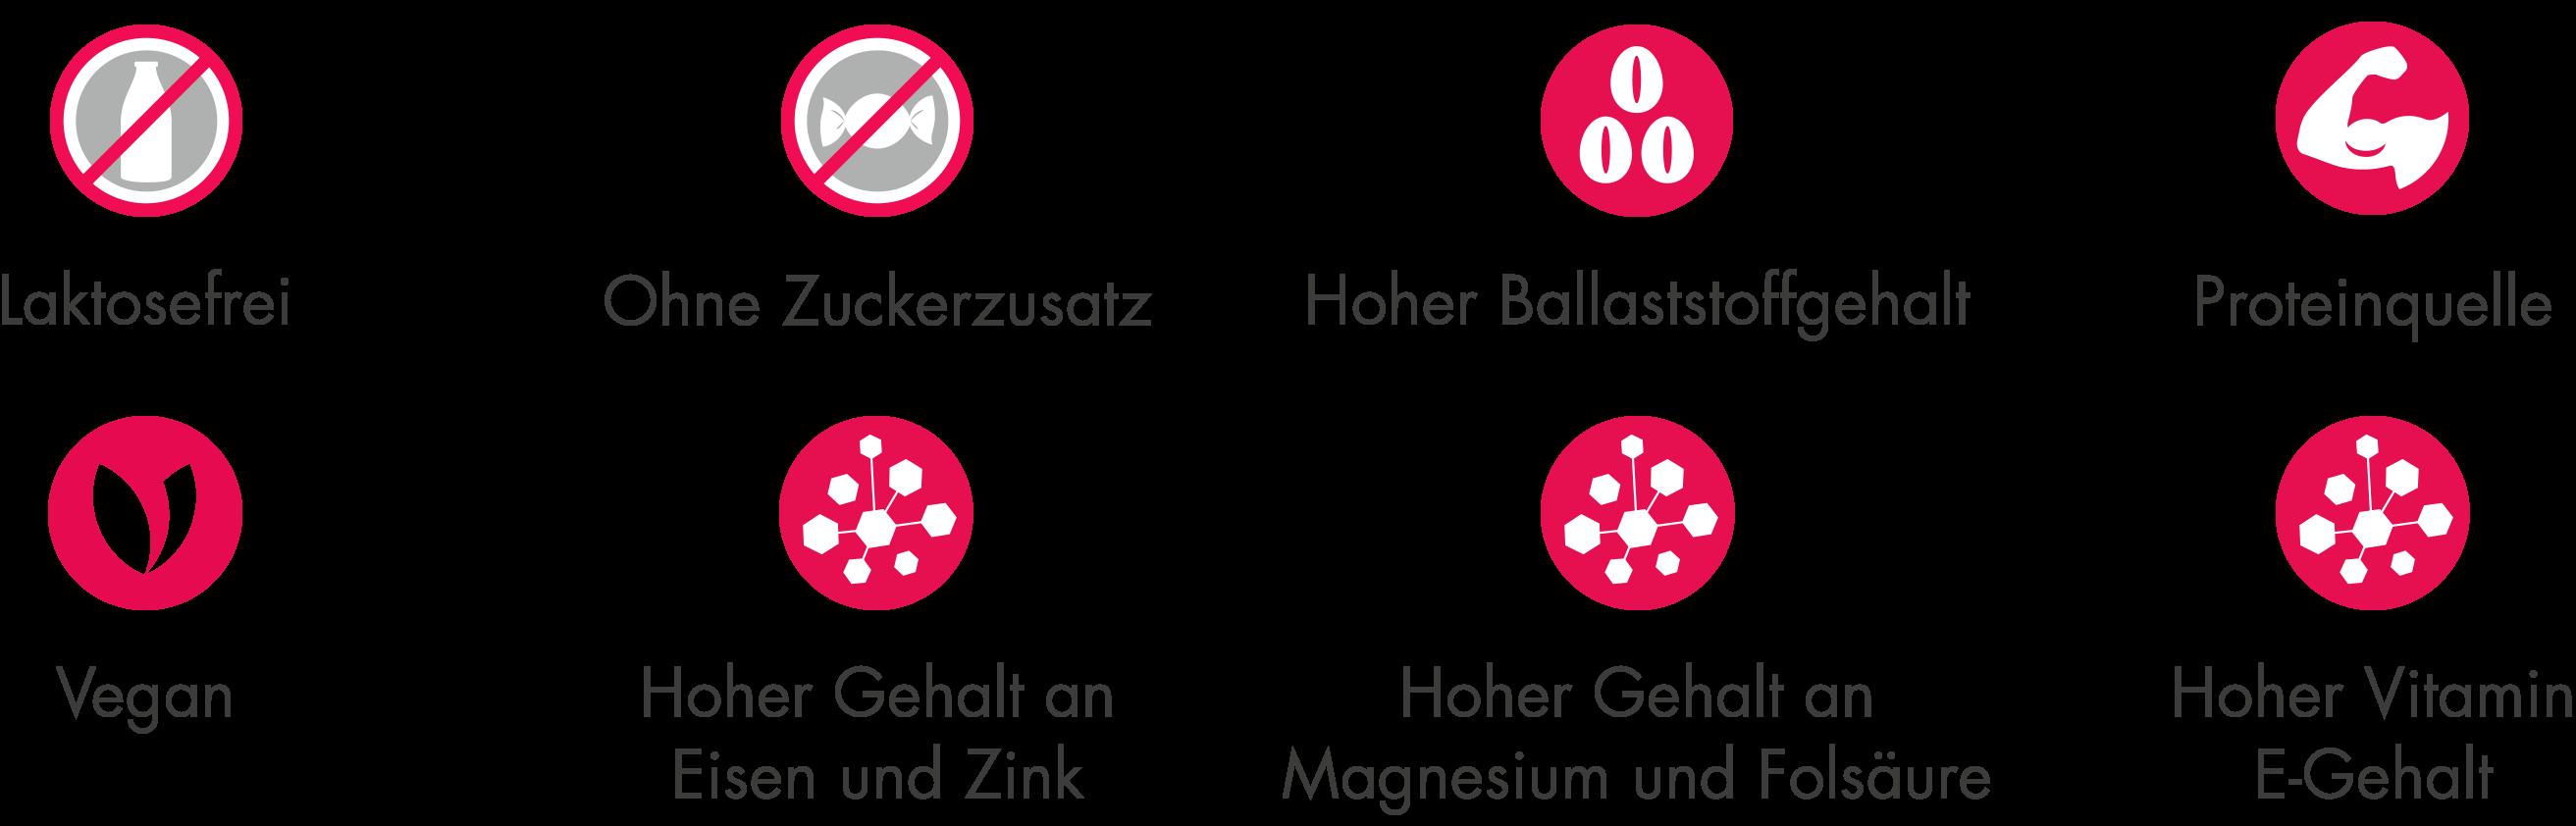 Low Carb Müsli aus Bio-Zutaten.